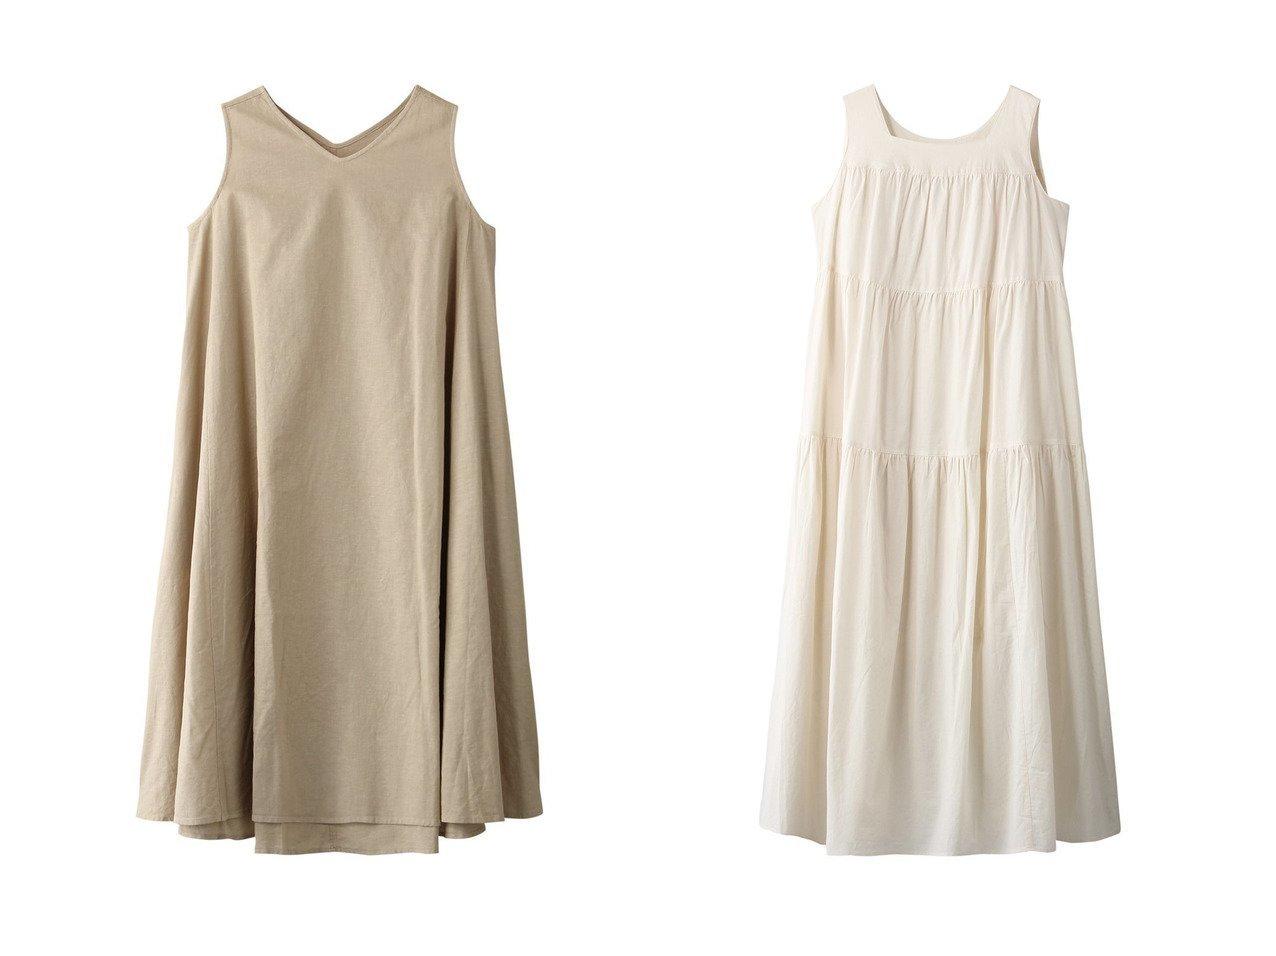 【KID BLUE/キッドブルー】の21ボタニカルリネンワンピース&21コットンローンワンピース 【ワンピース・ドレス】おすすめ!人気、トレンド・レディースファッションの通販 おすすめで人気の流行・トレンド、ファッションの通販商品 インテリア・家具・メンズファッション・キッズファッション・レディースファッション・服の通販 founy(ファニー) https://founy.com/ ファッション Fashion レディースファッション WOMEN ワンピース Dress S/S・春夏 SS・Spring/Summer ノースリーブ フレア リネン 春 Spring エアリー フェミニン  ID:crp329100000040347